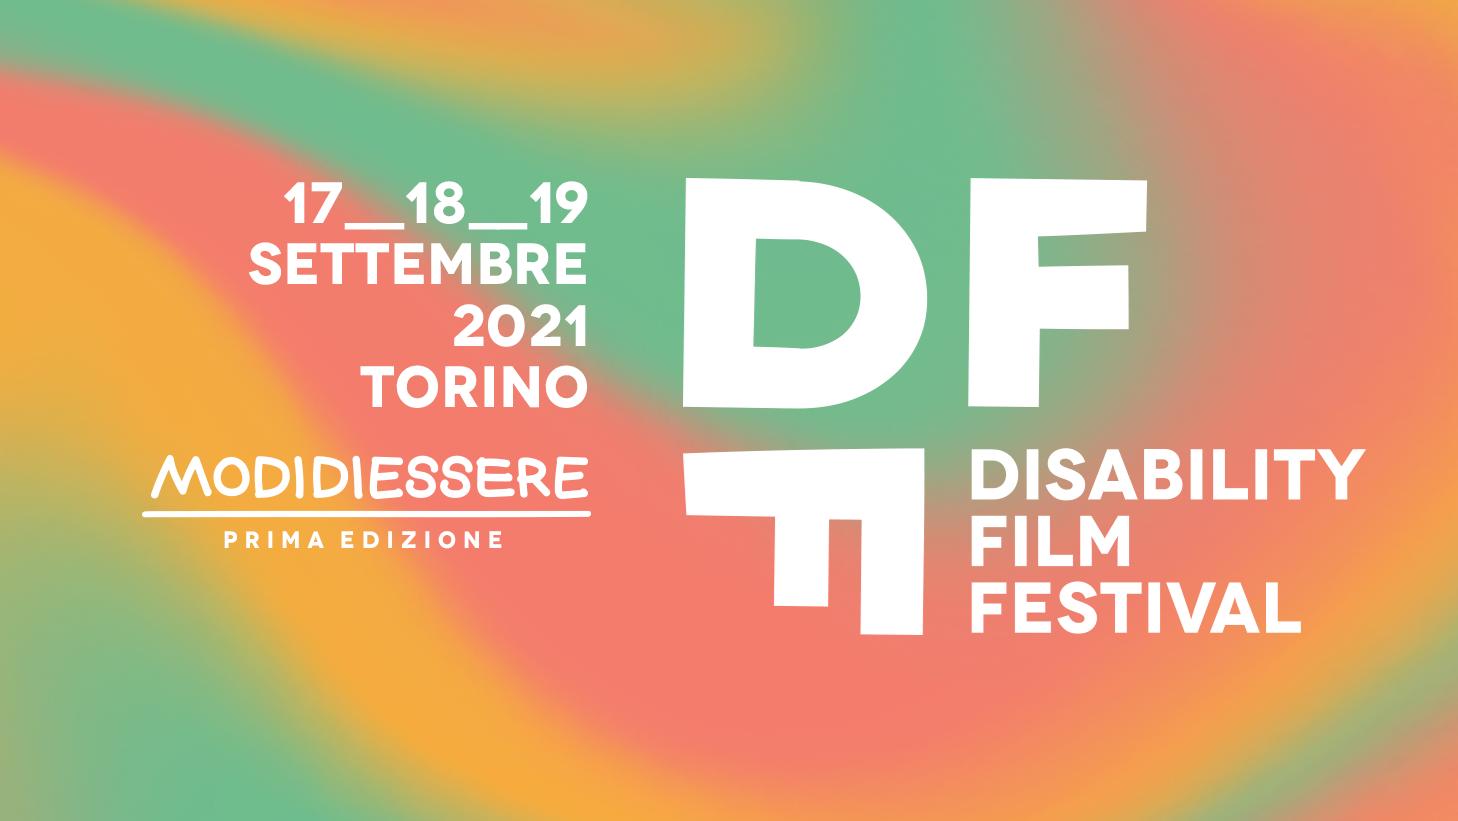 Disability film festival in via Baltea